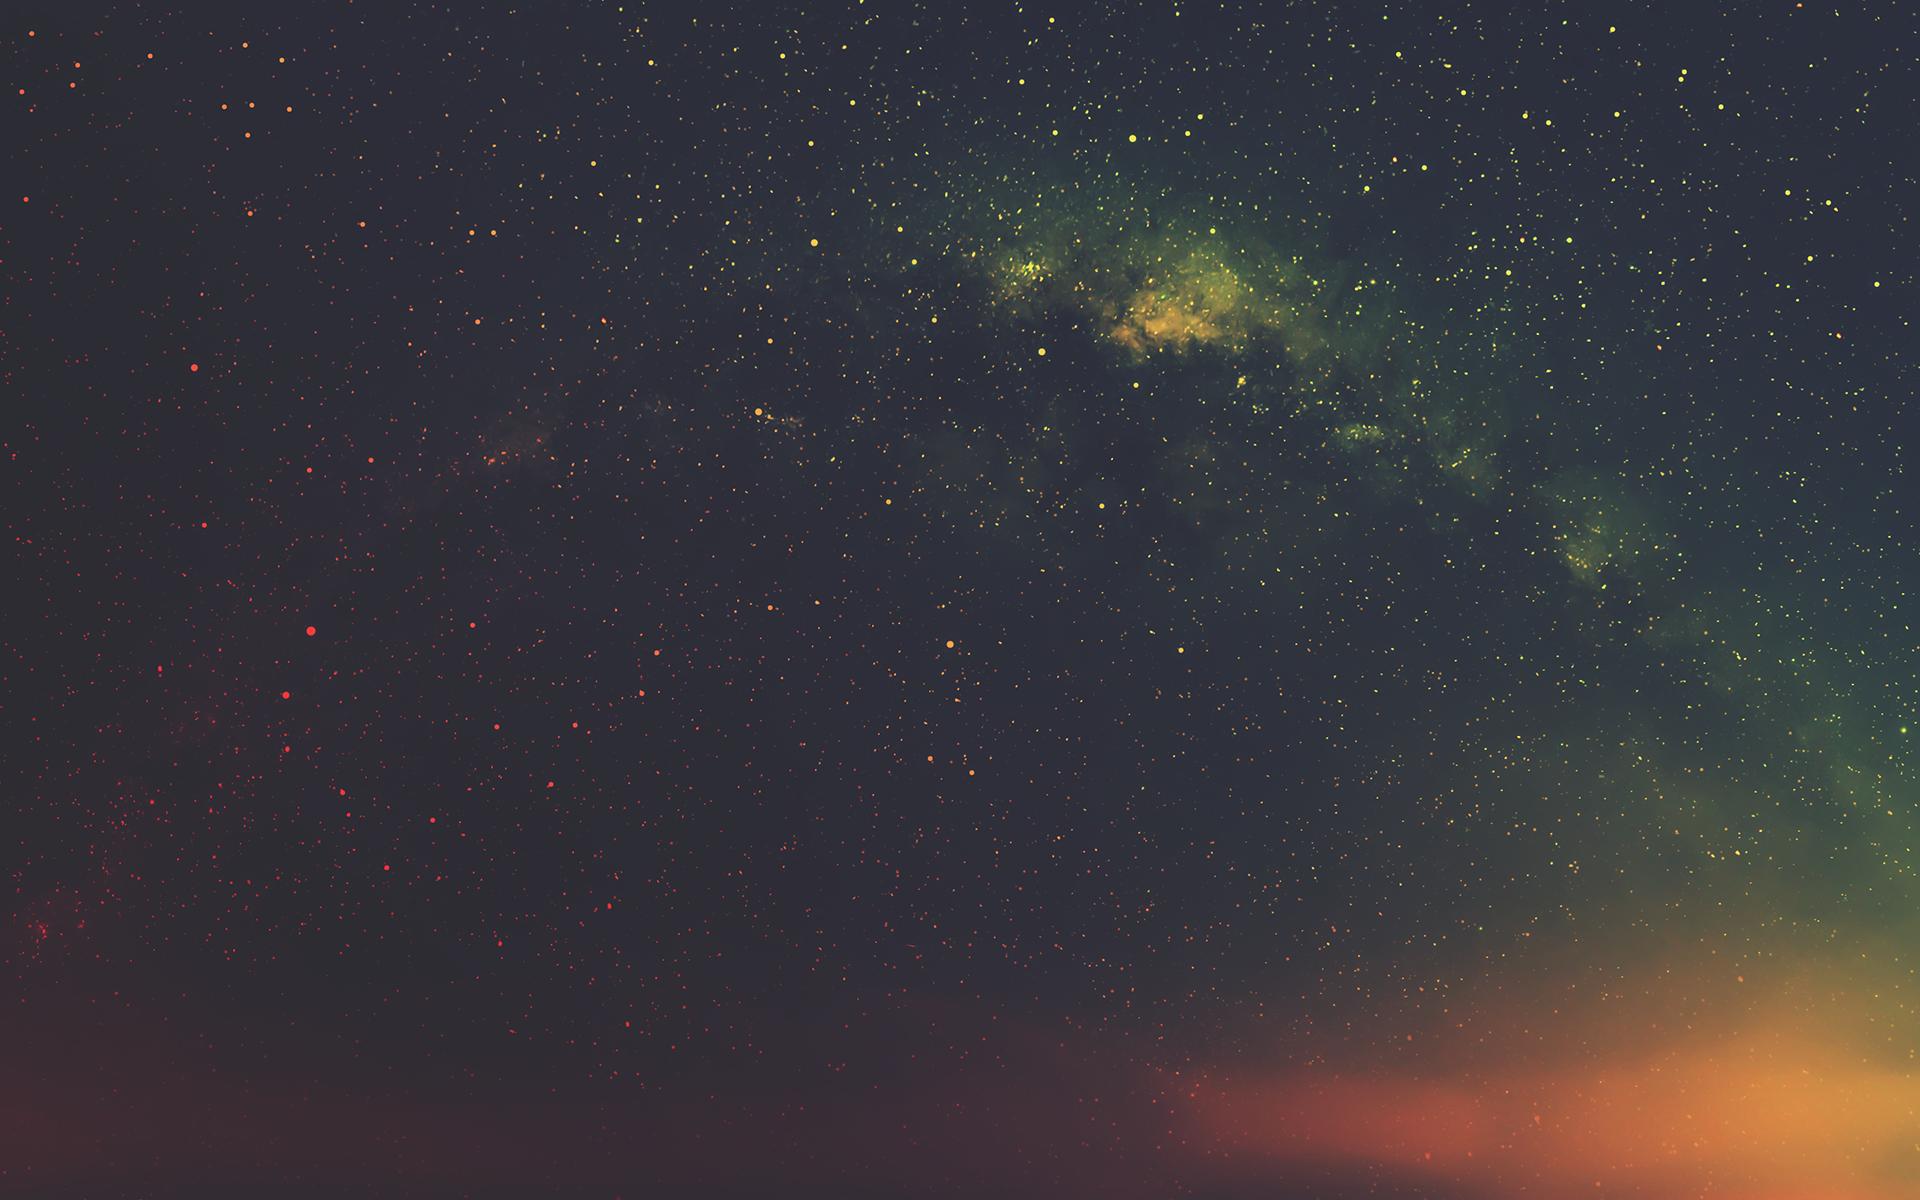 Fantastic Wallpaper Night Dark - pexels-photo-14676  Graphic.jpg\u0026fm\u003djpg